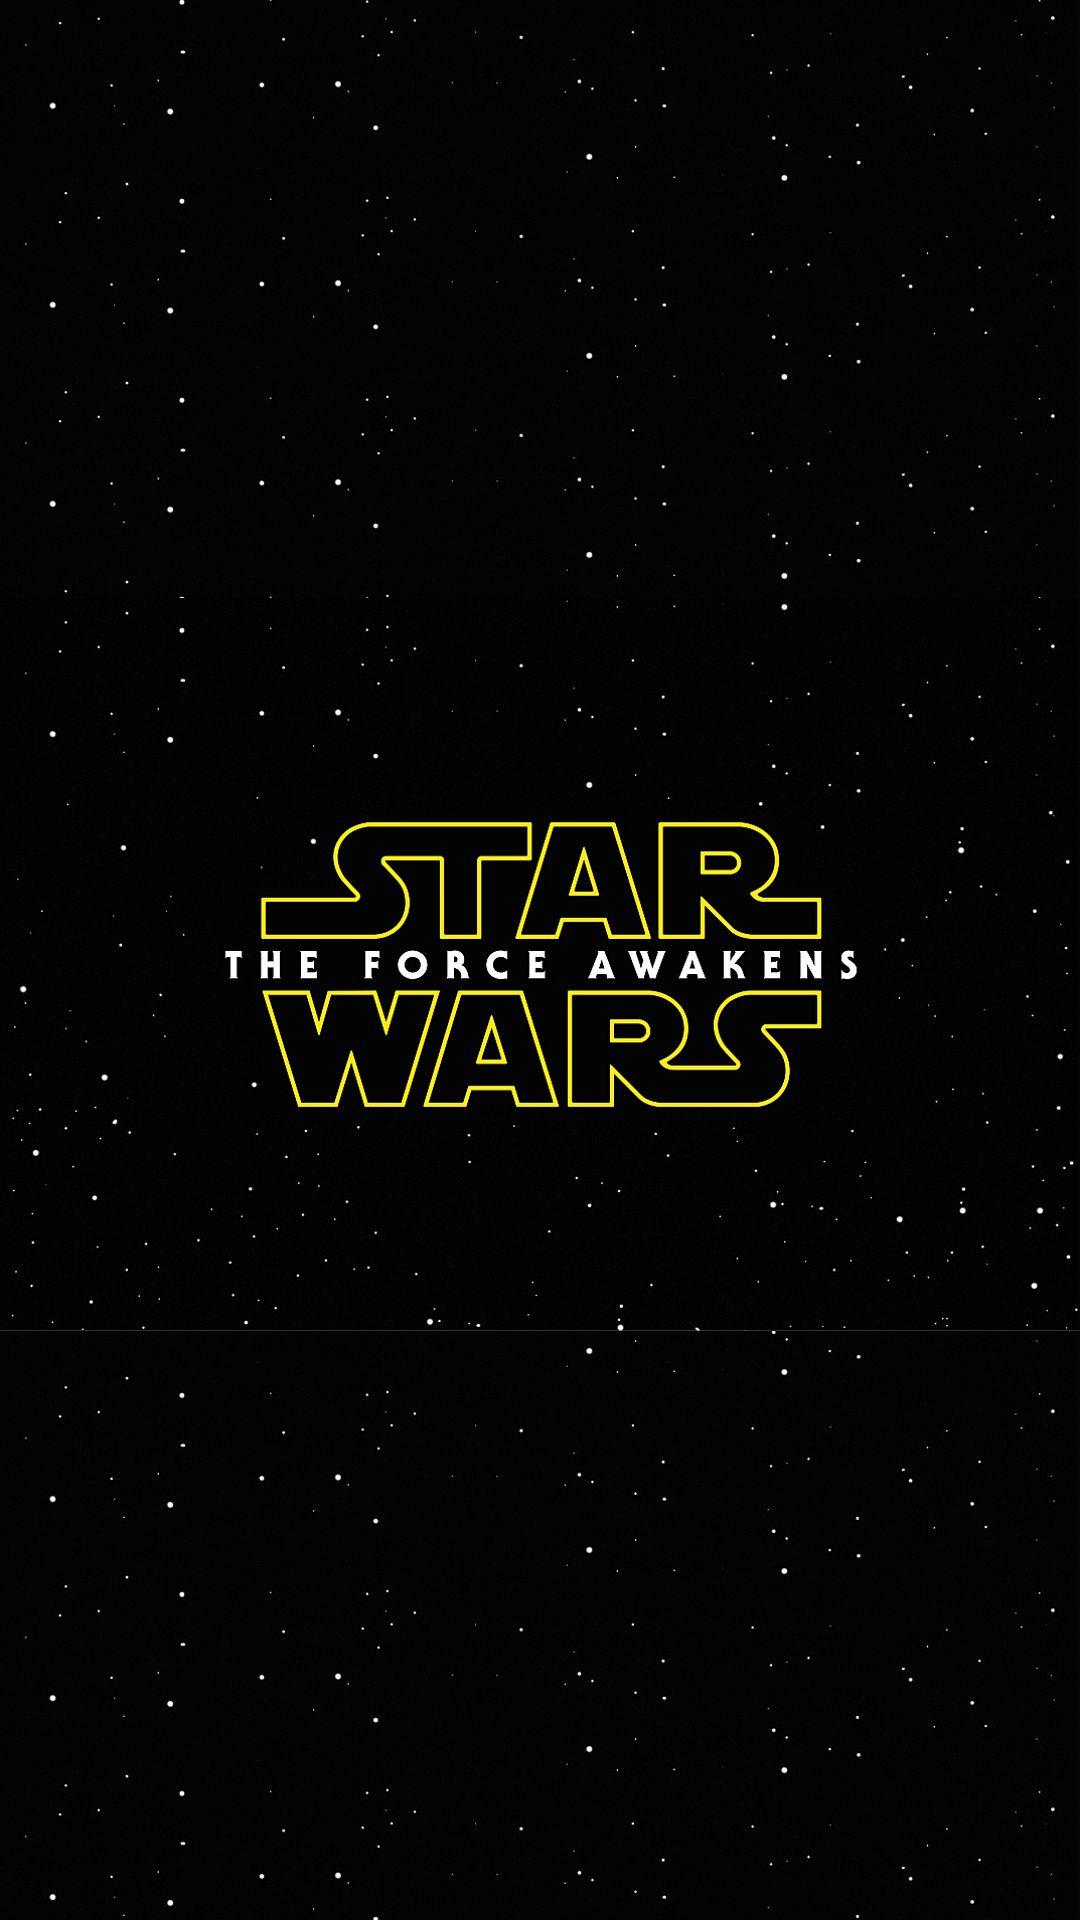 STAR WARS DARTH VADER LUKE SKYWALKER CANVAS CUSHION PILLOW KIDS FORCE AWAKENS